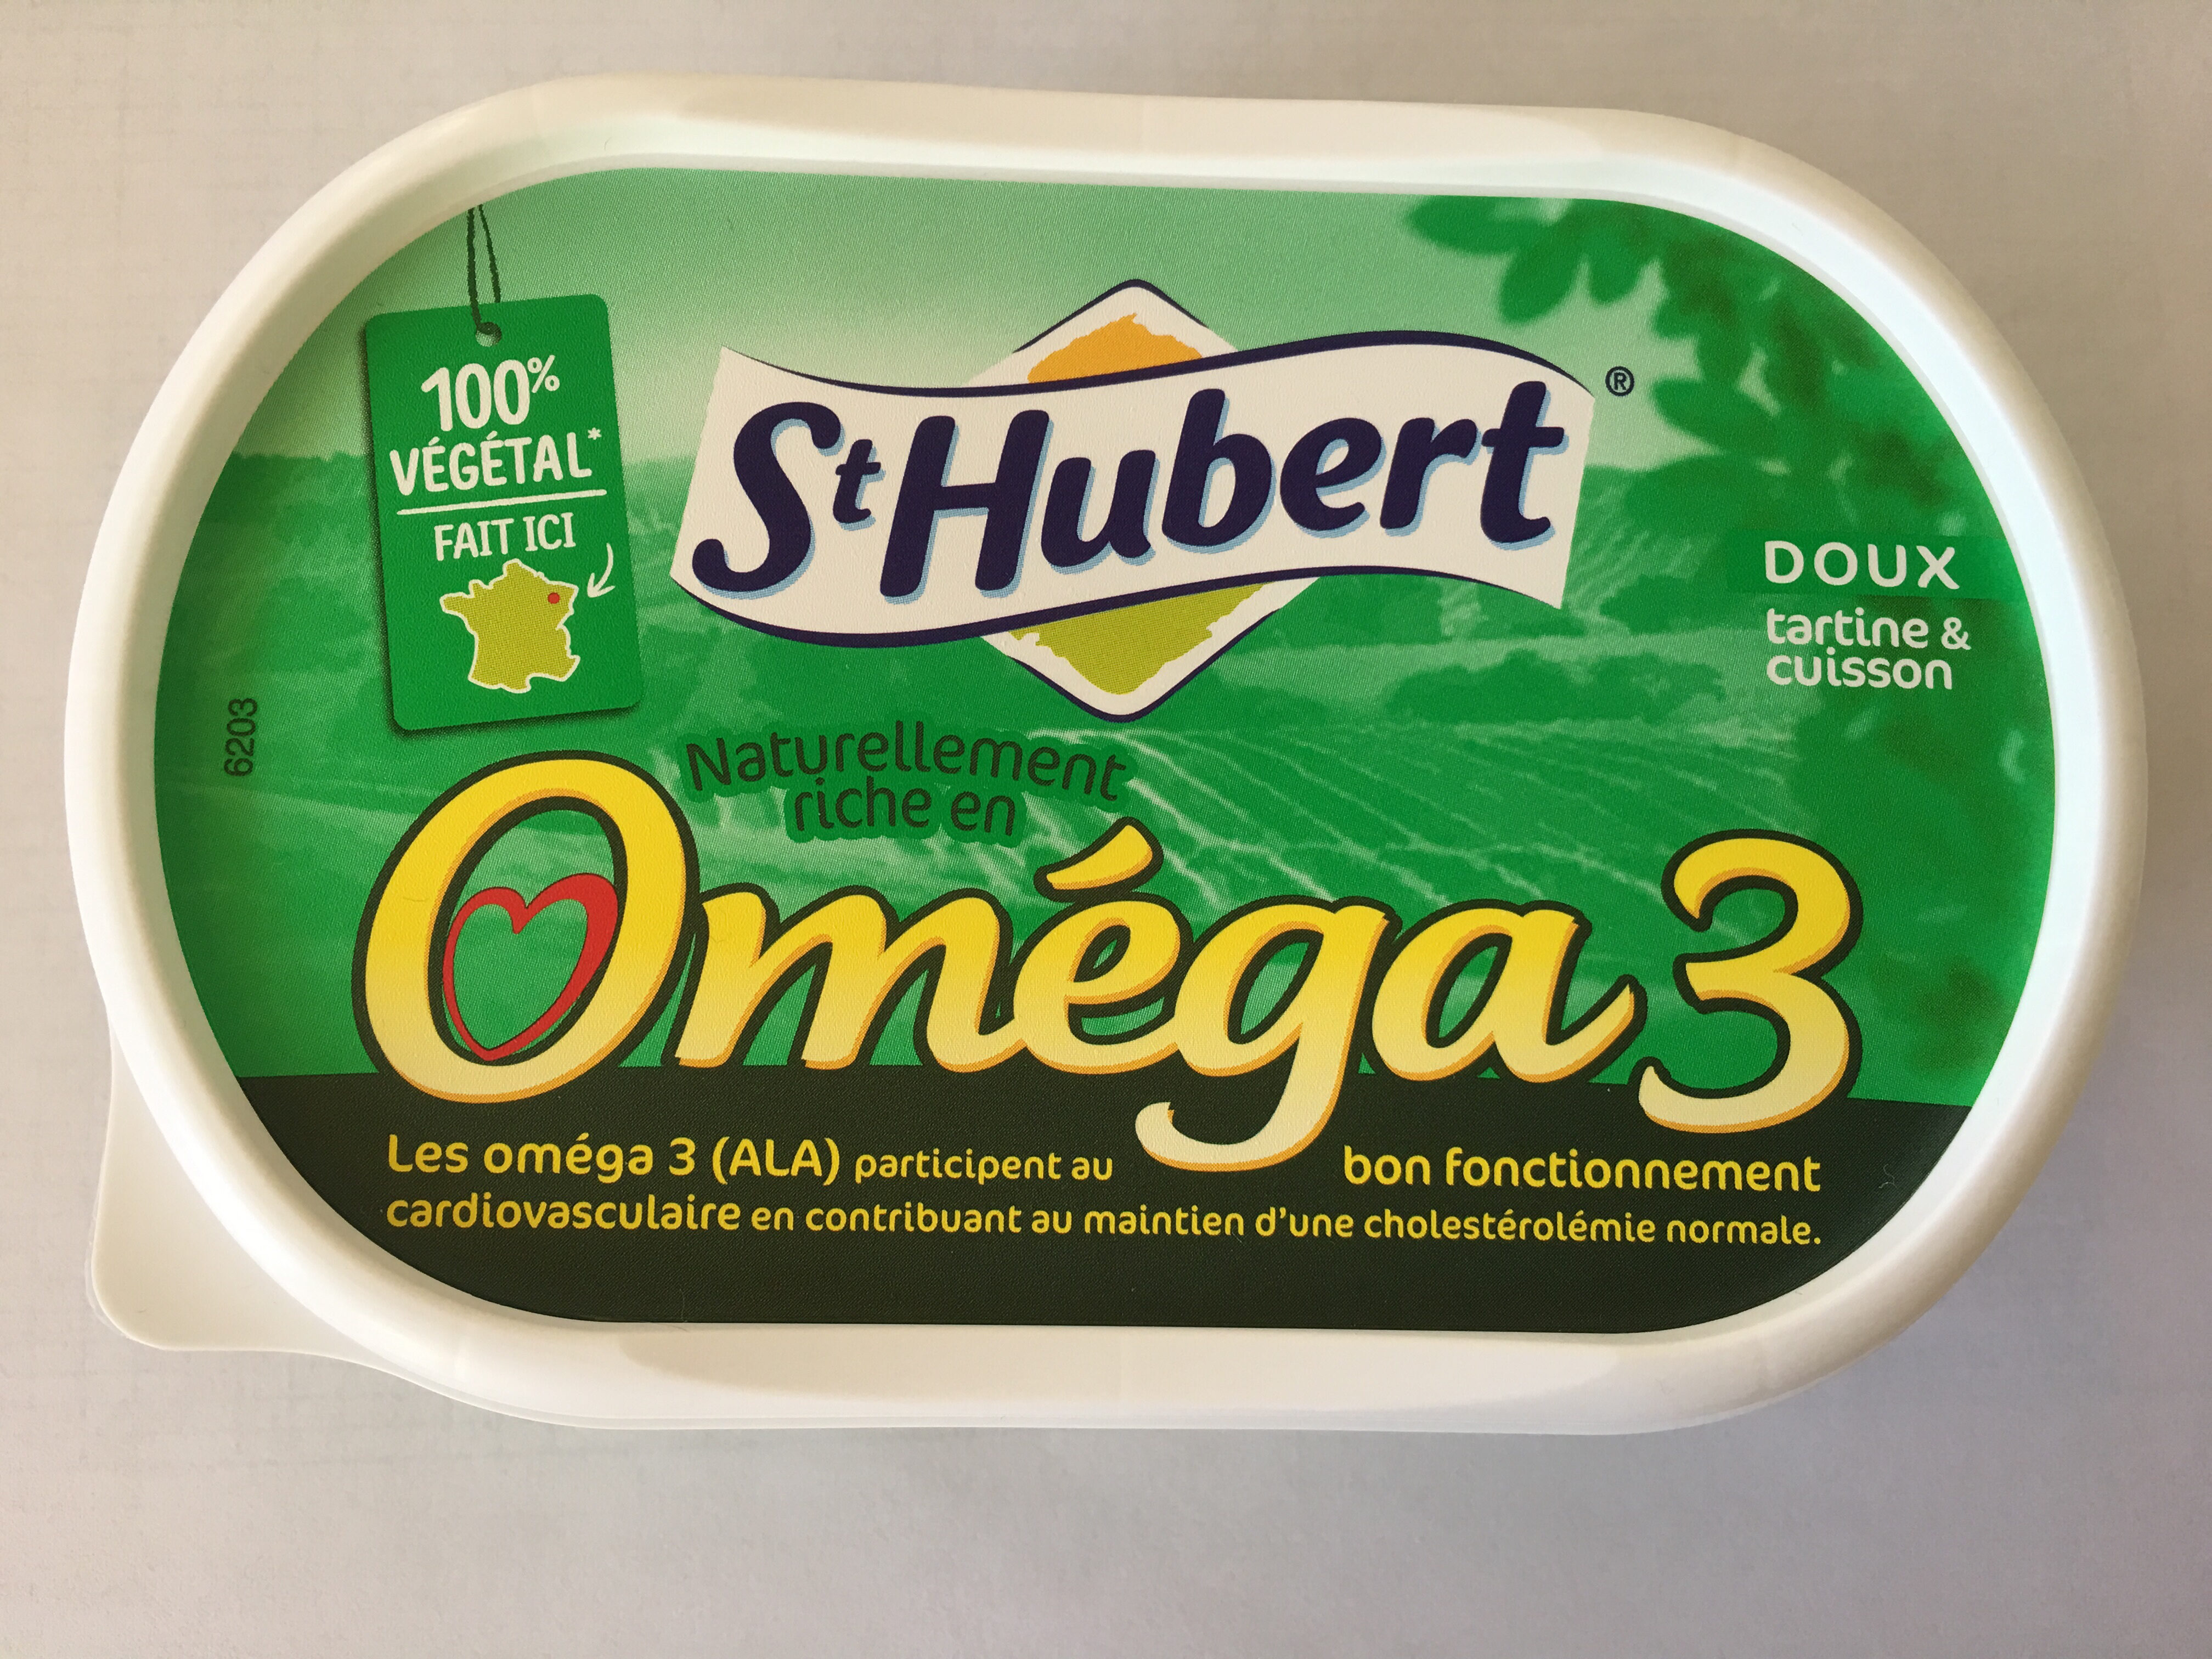 St Hubert Oméga 3 255g doux - Product - fr